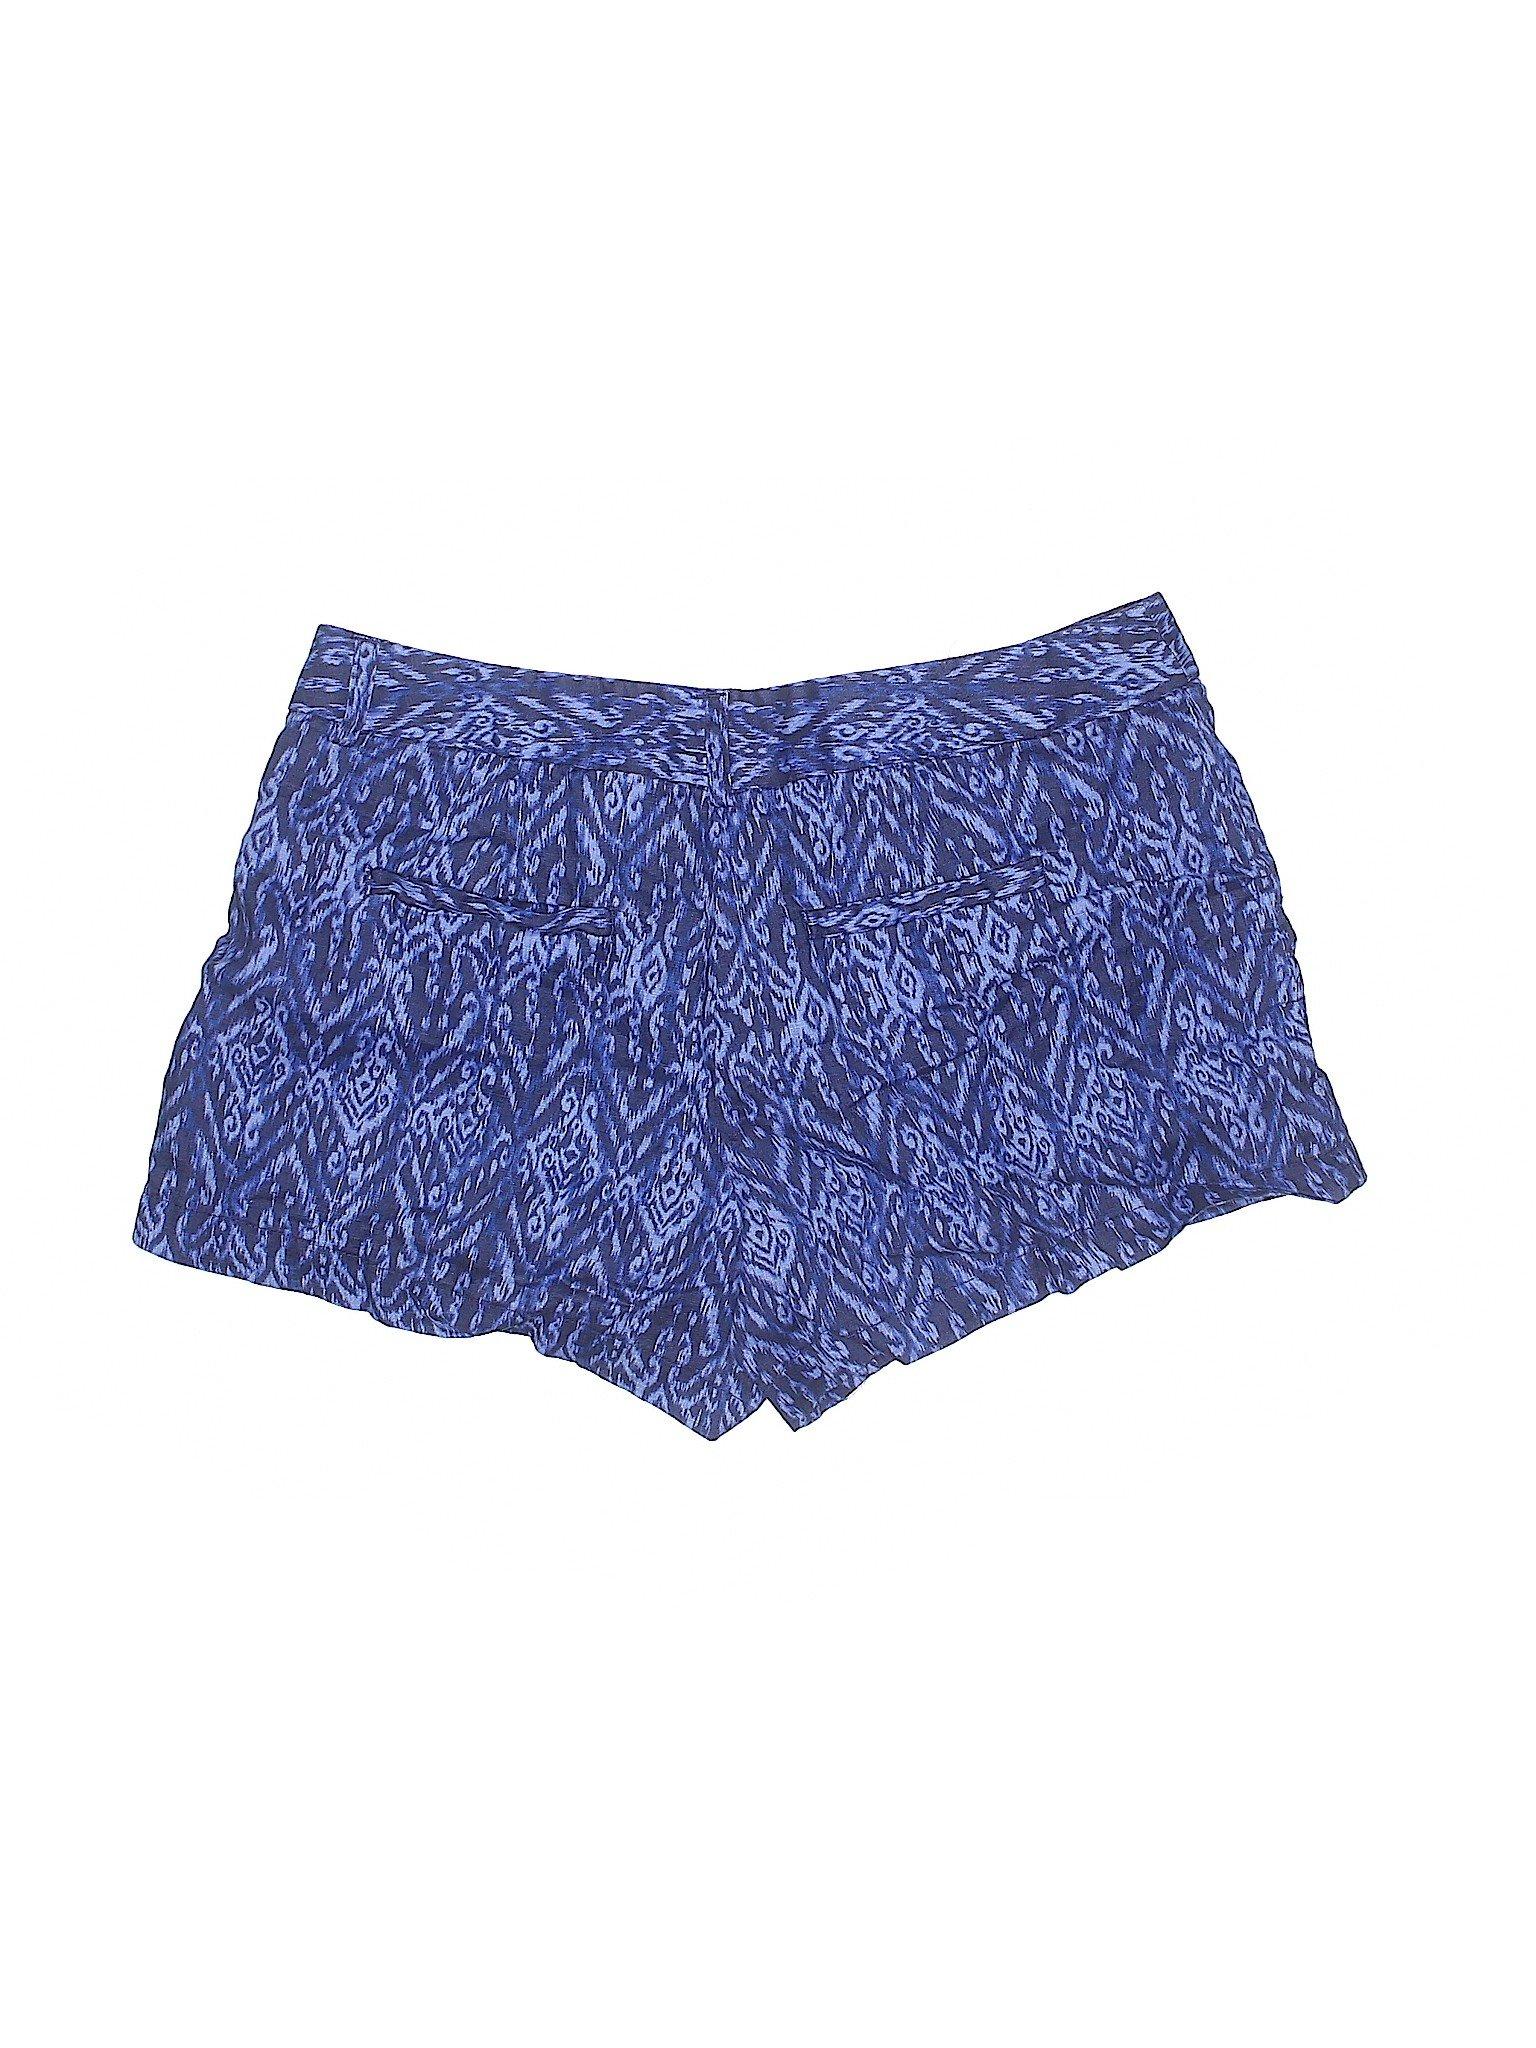 Cynthia Marshalls for Rowley Shorts Boutique FCqwzf6w